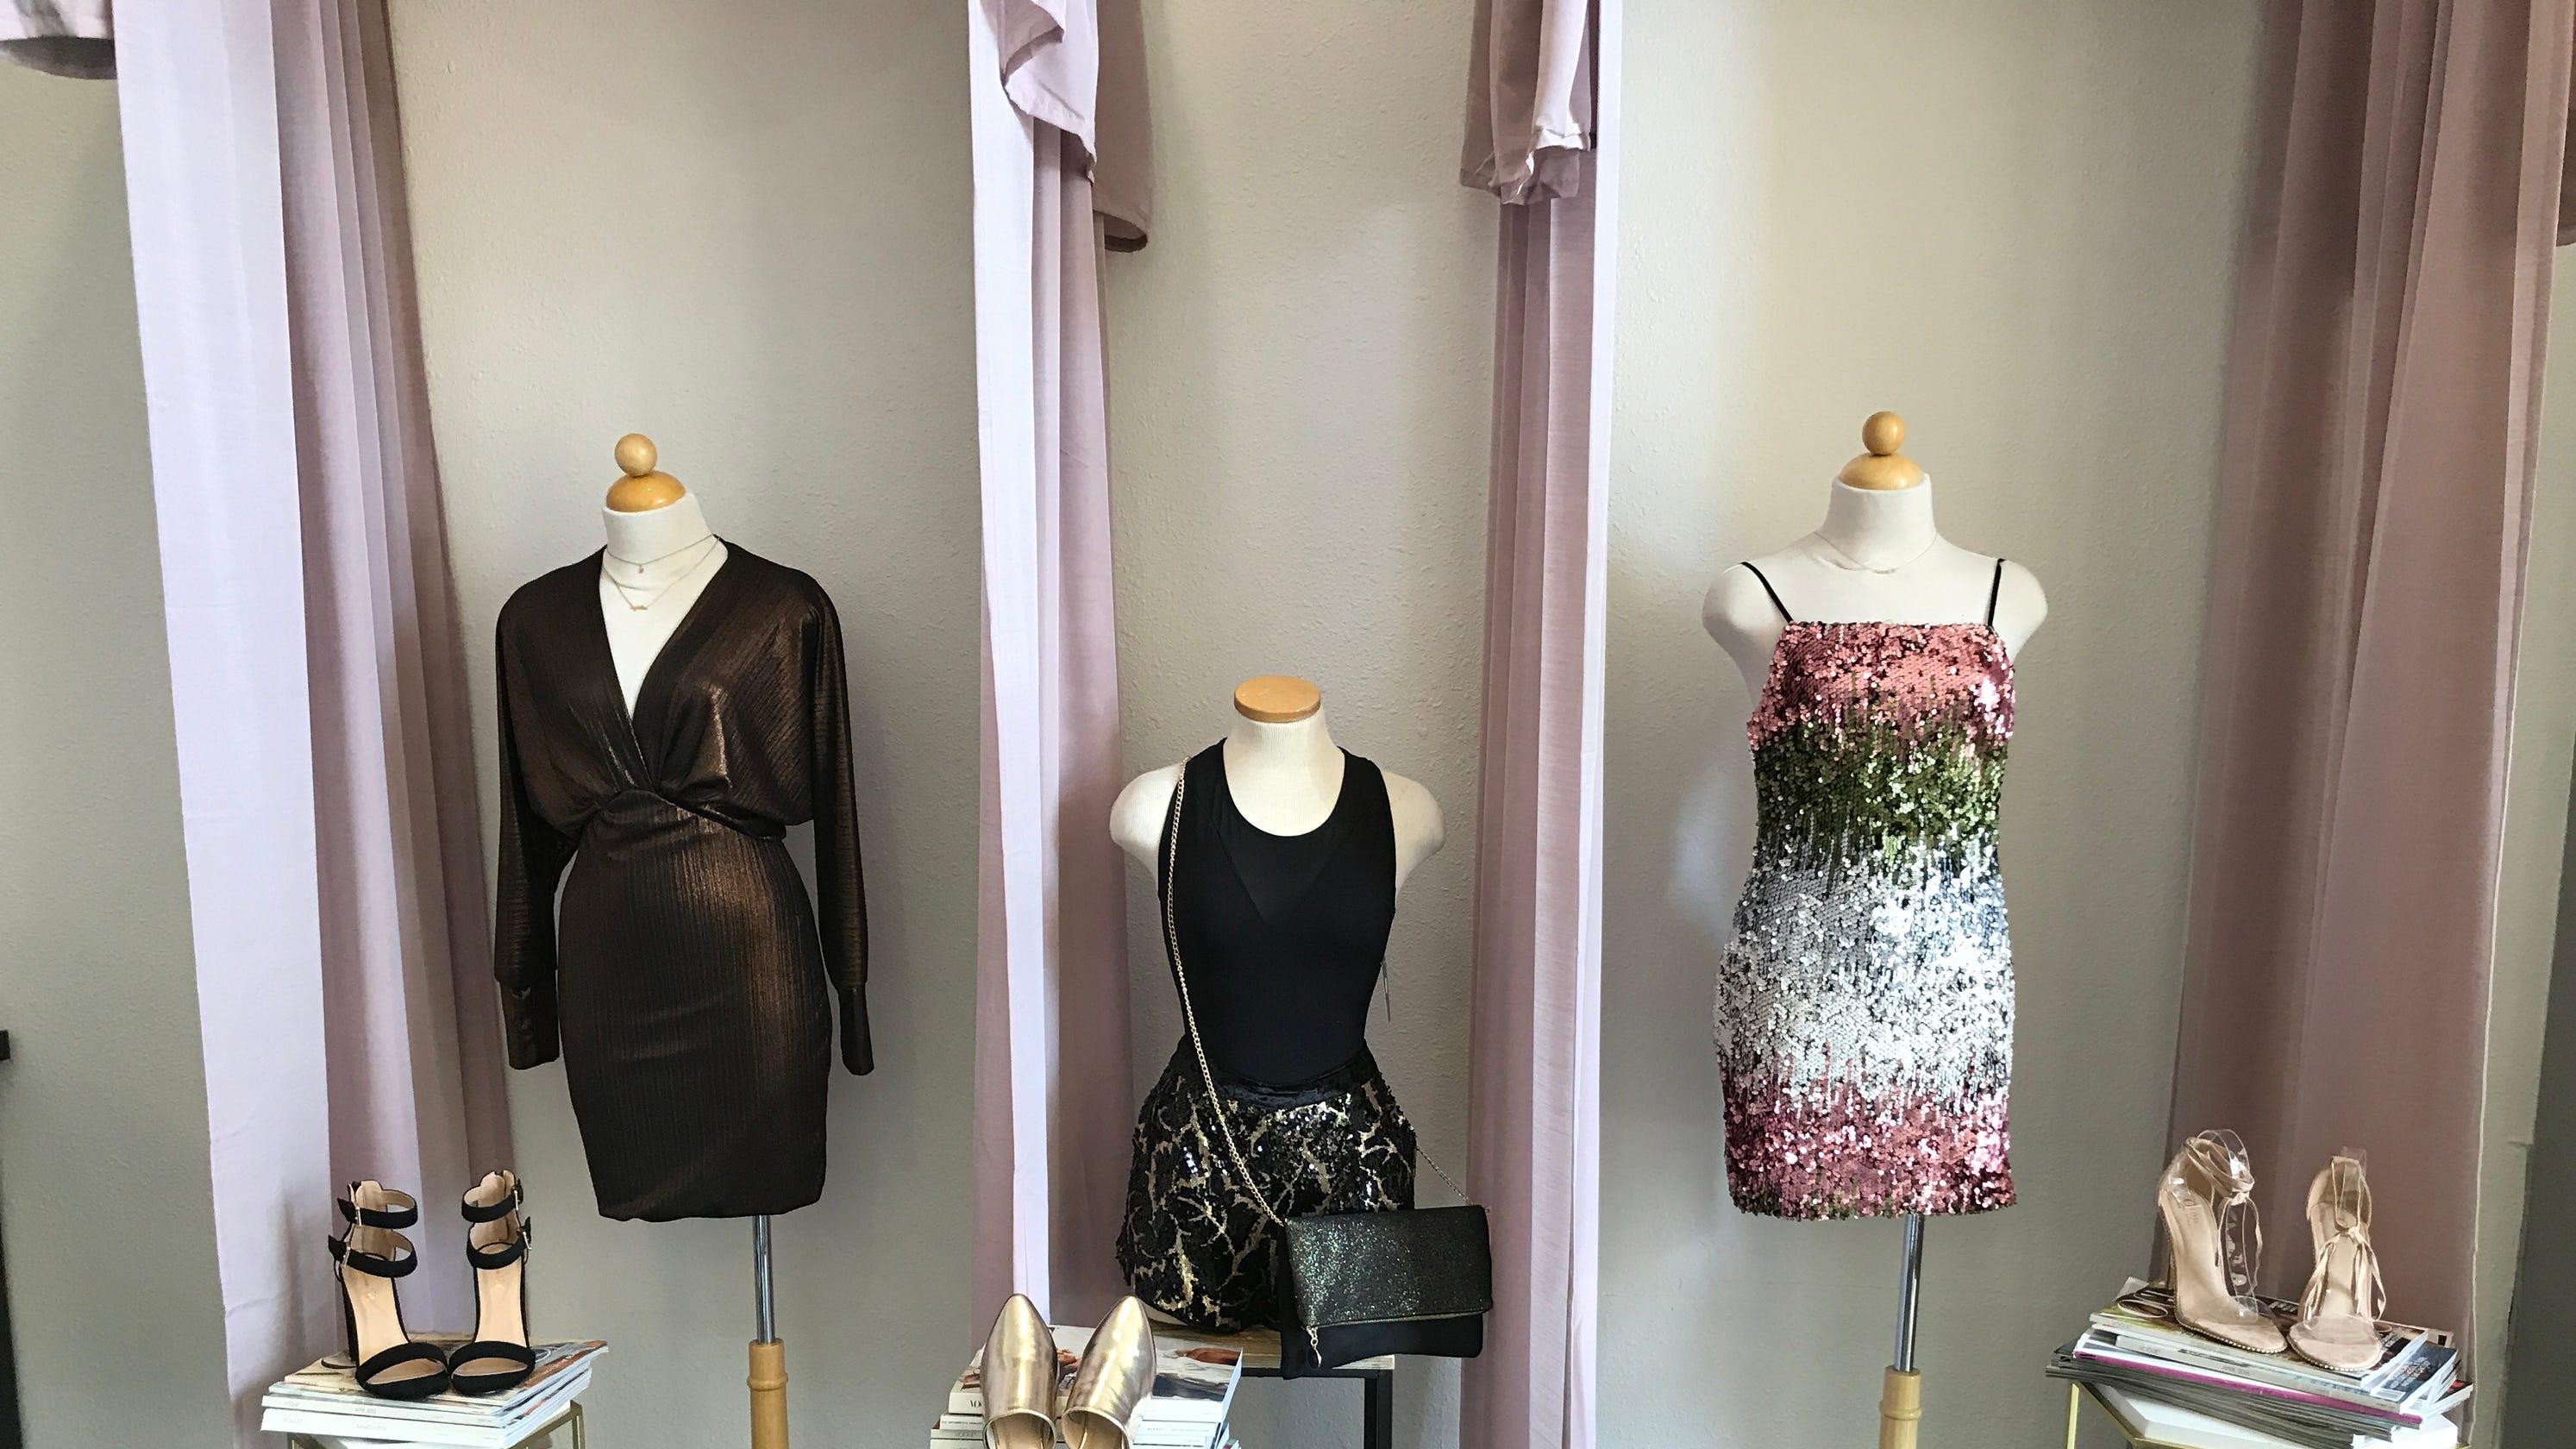 e13599cd10 Small Business Saturday: El Paso shop local Christmas gift ideas